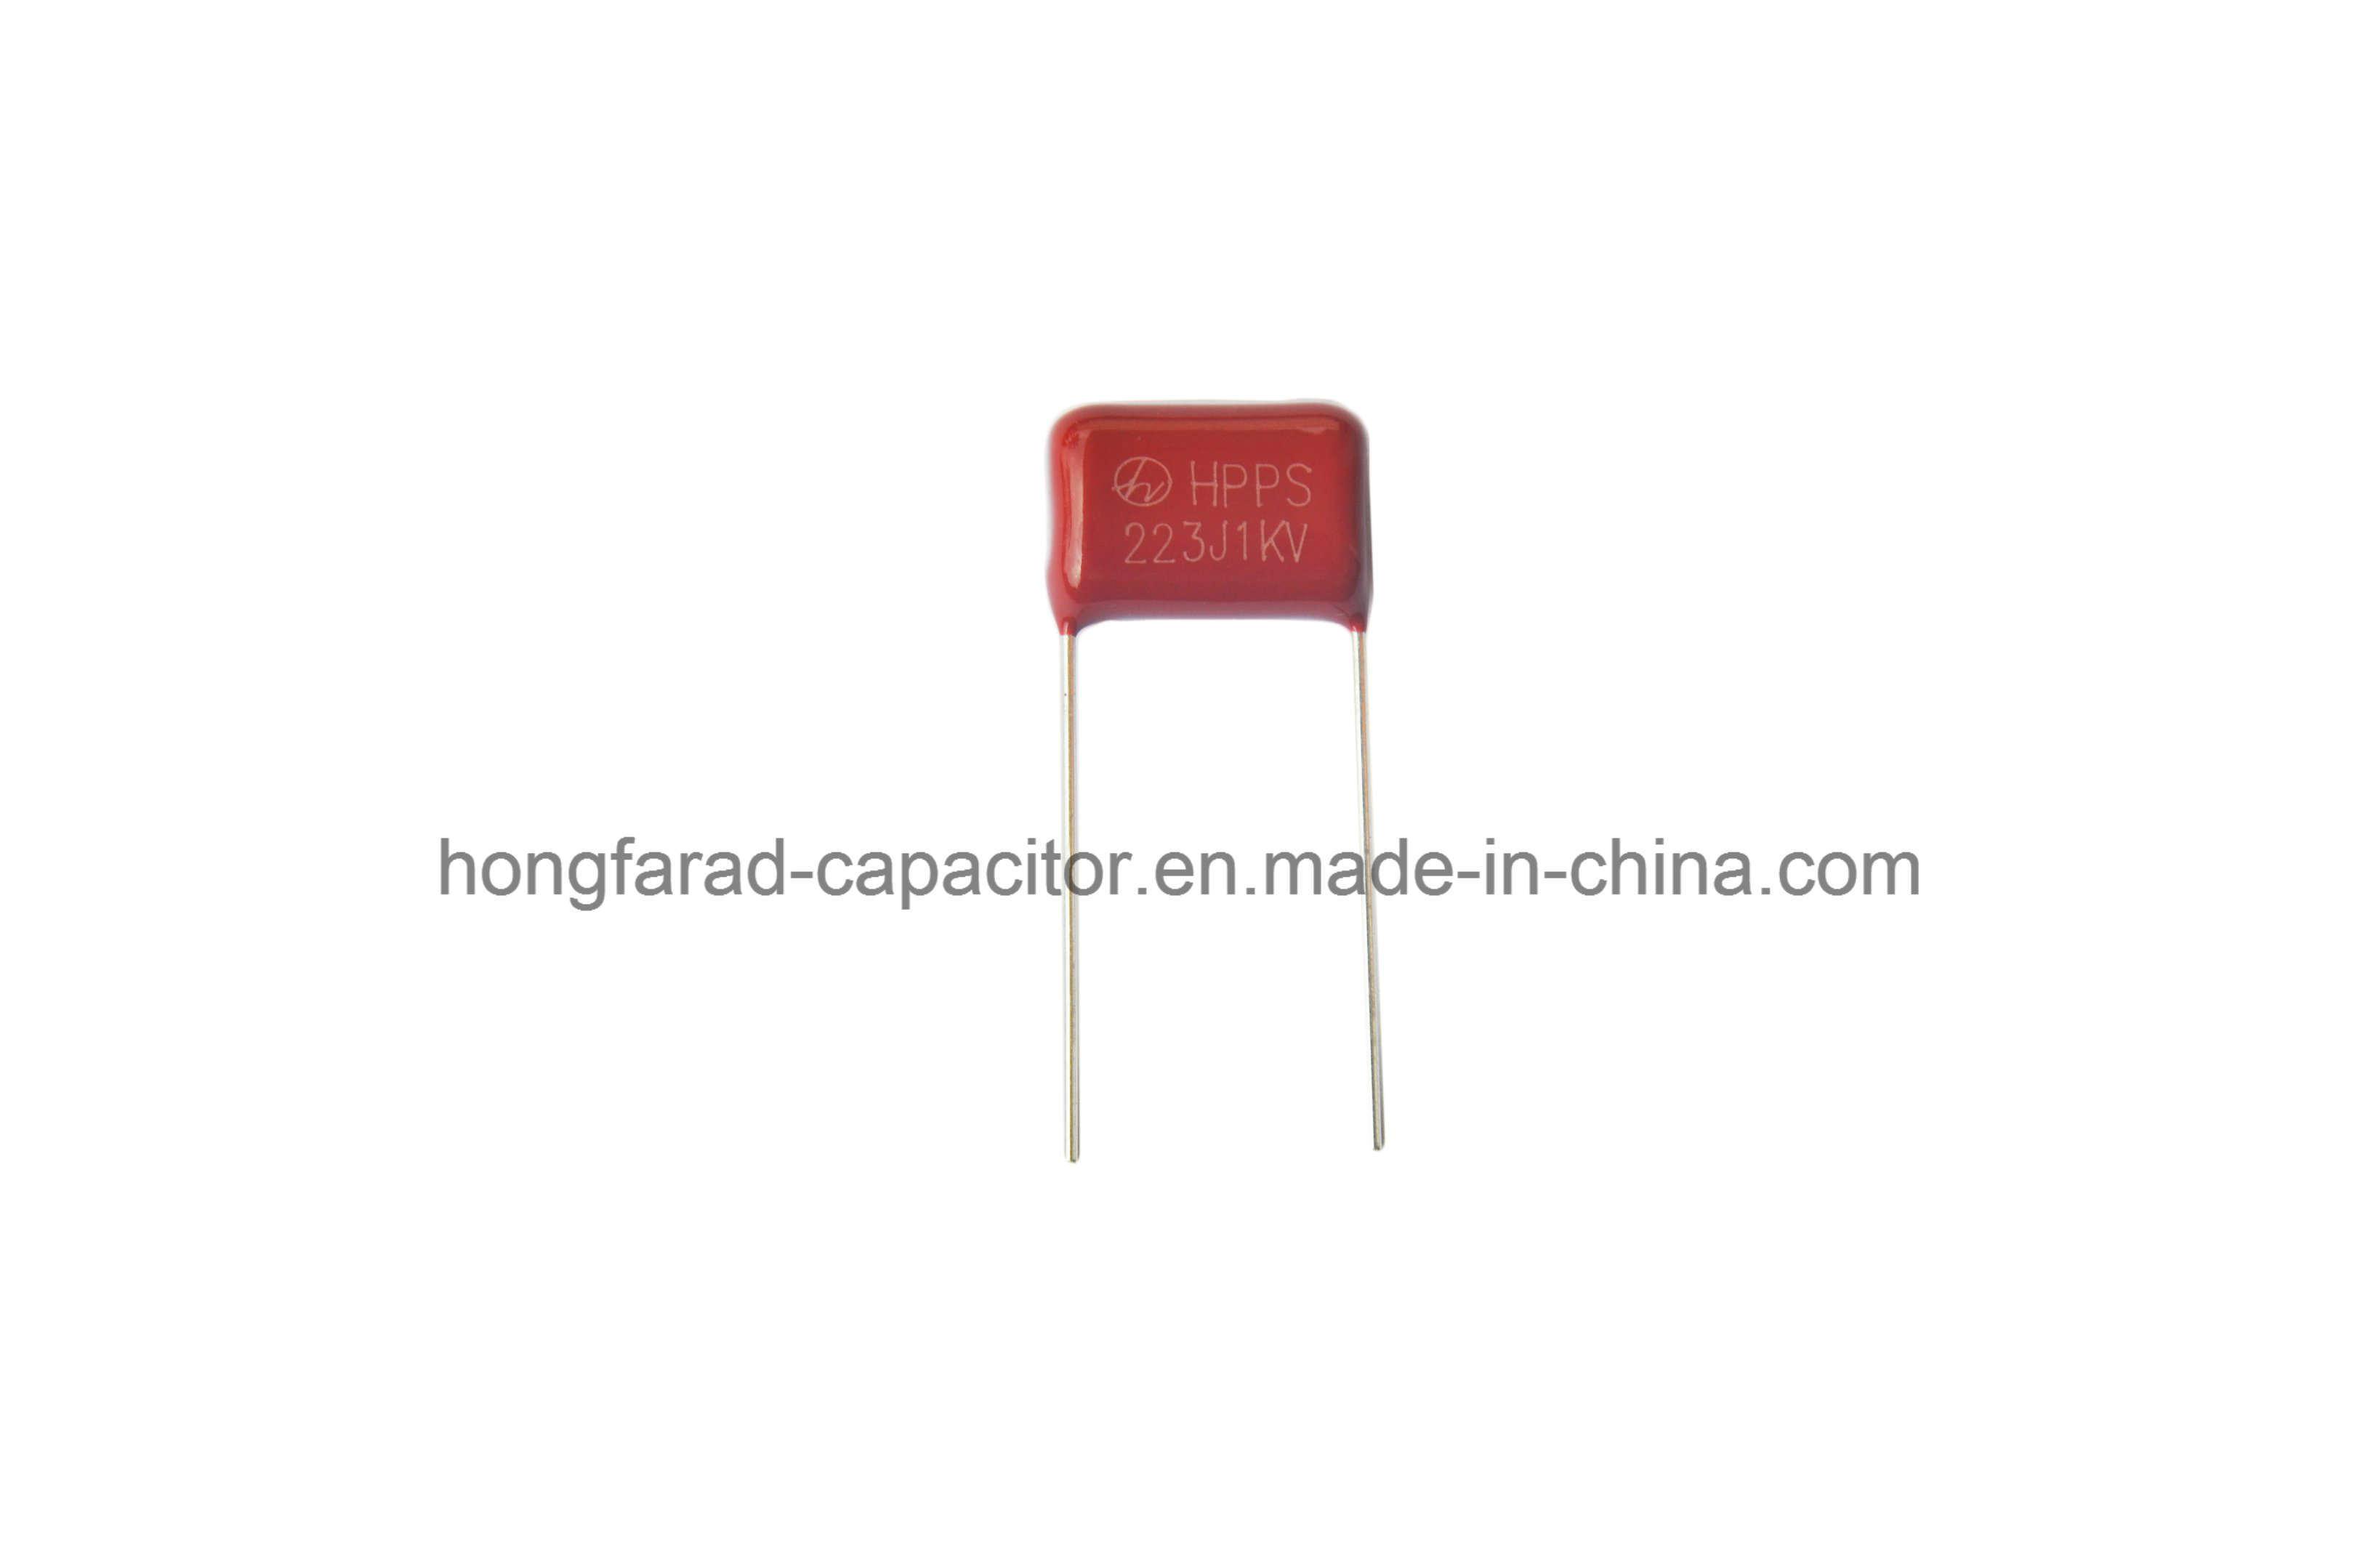 Cbb21 Mpp Metallized Polypropylene Film Capacitor for PCBA